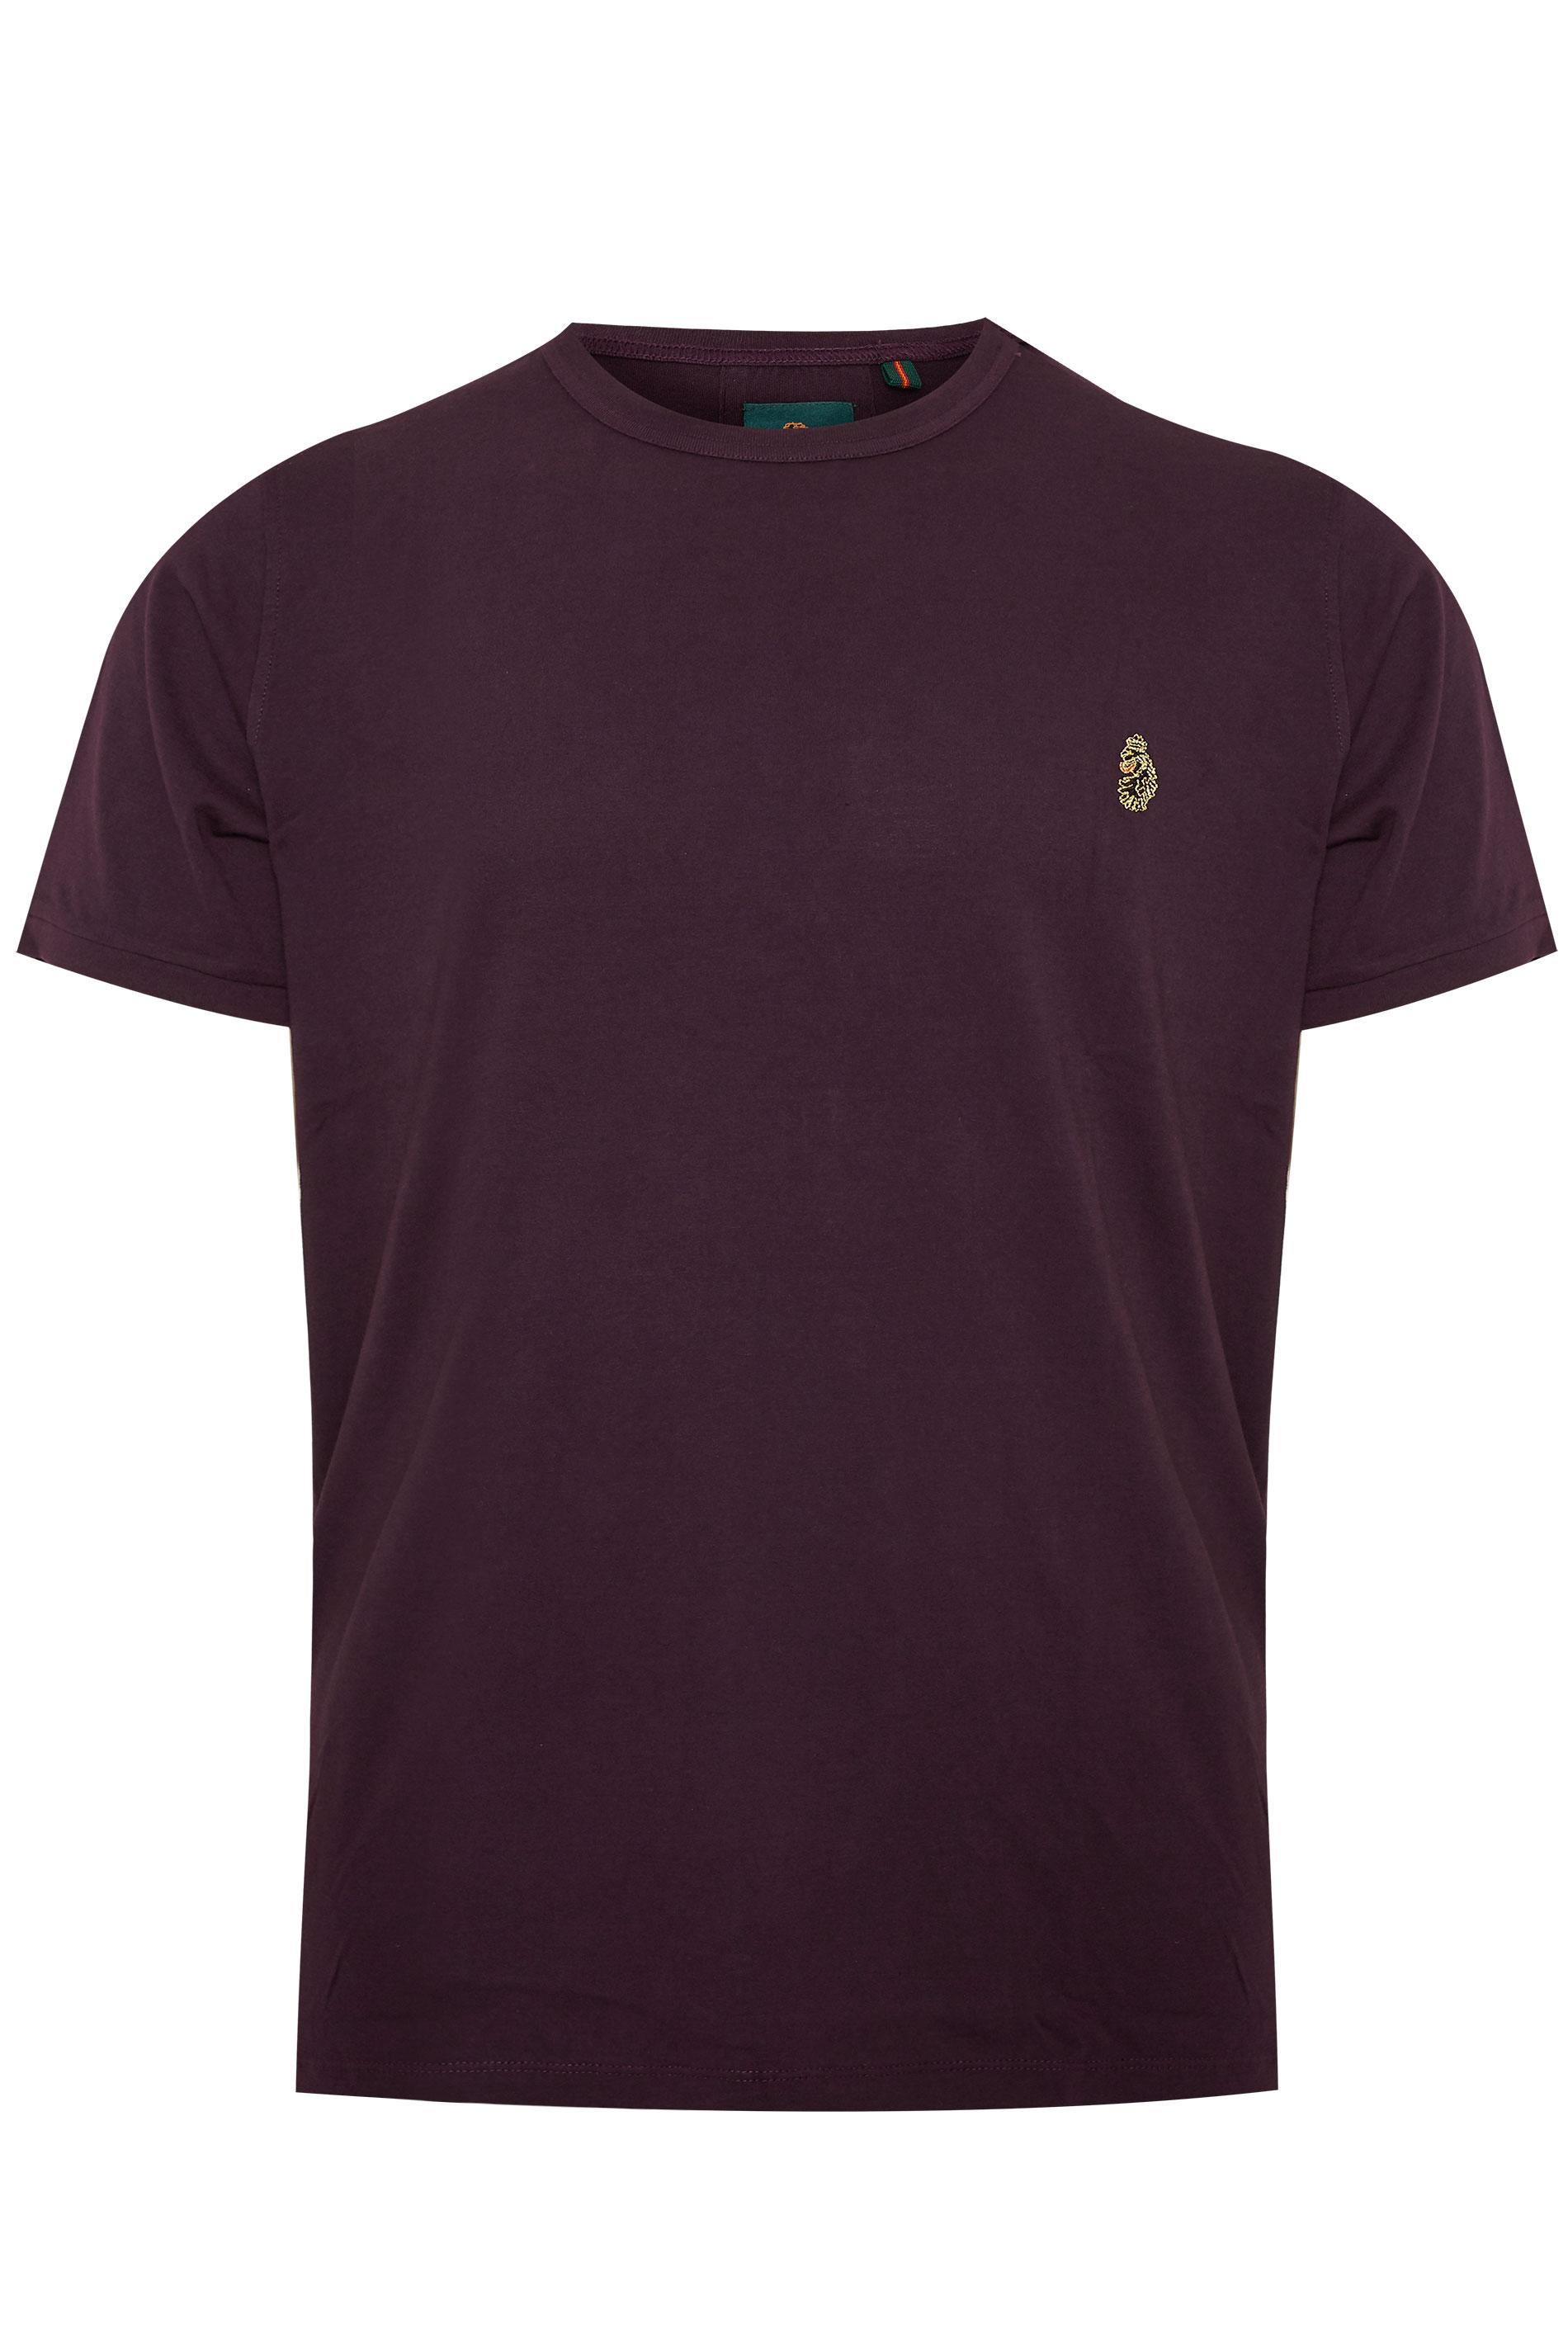 LUKE 1977 - T-shirt van katoen in bordeauxrood